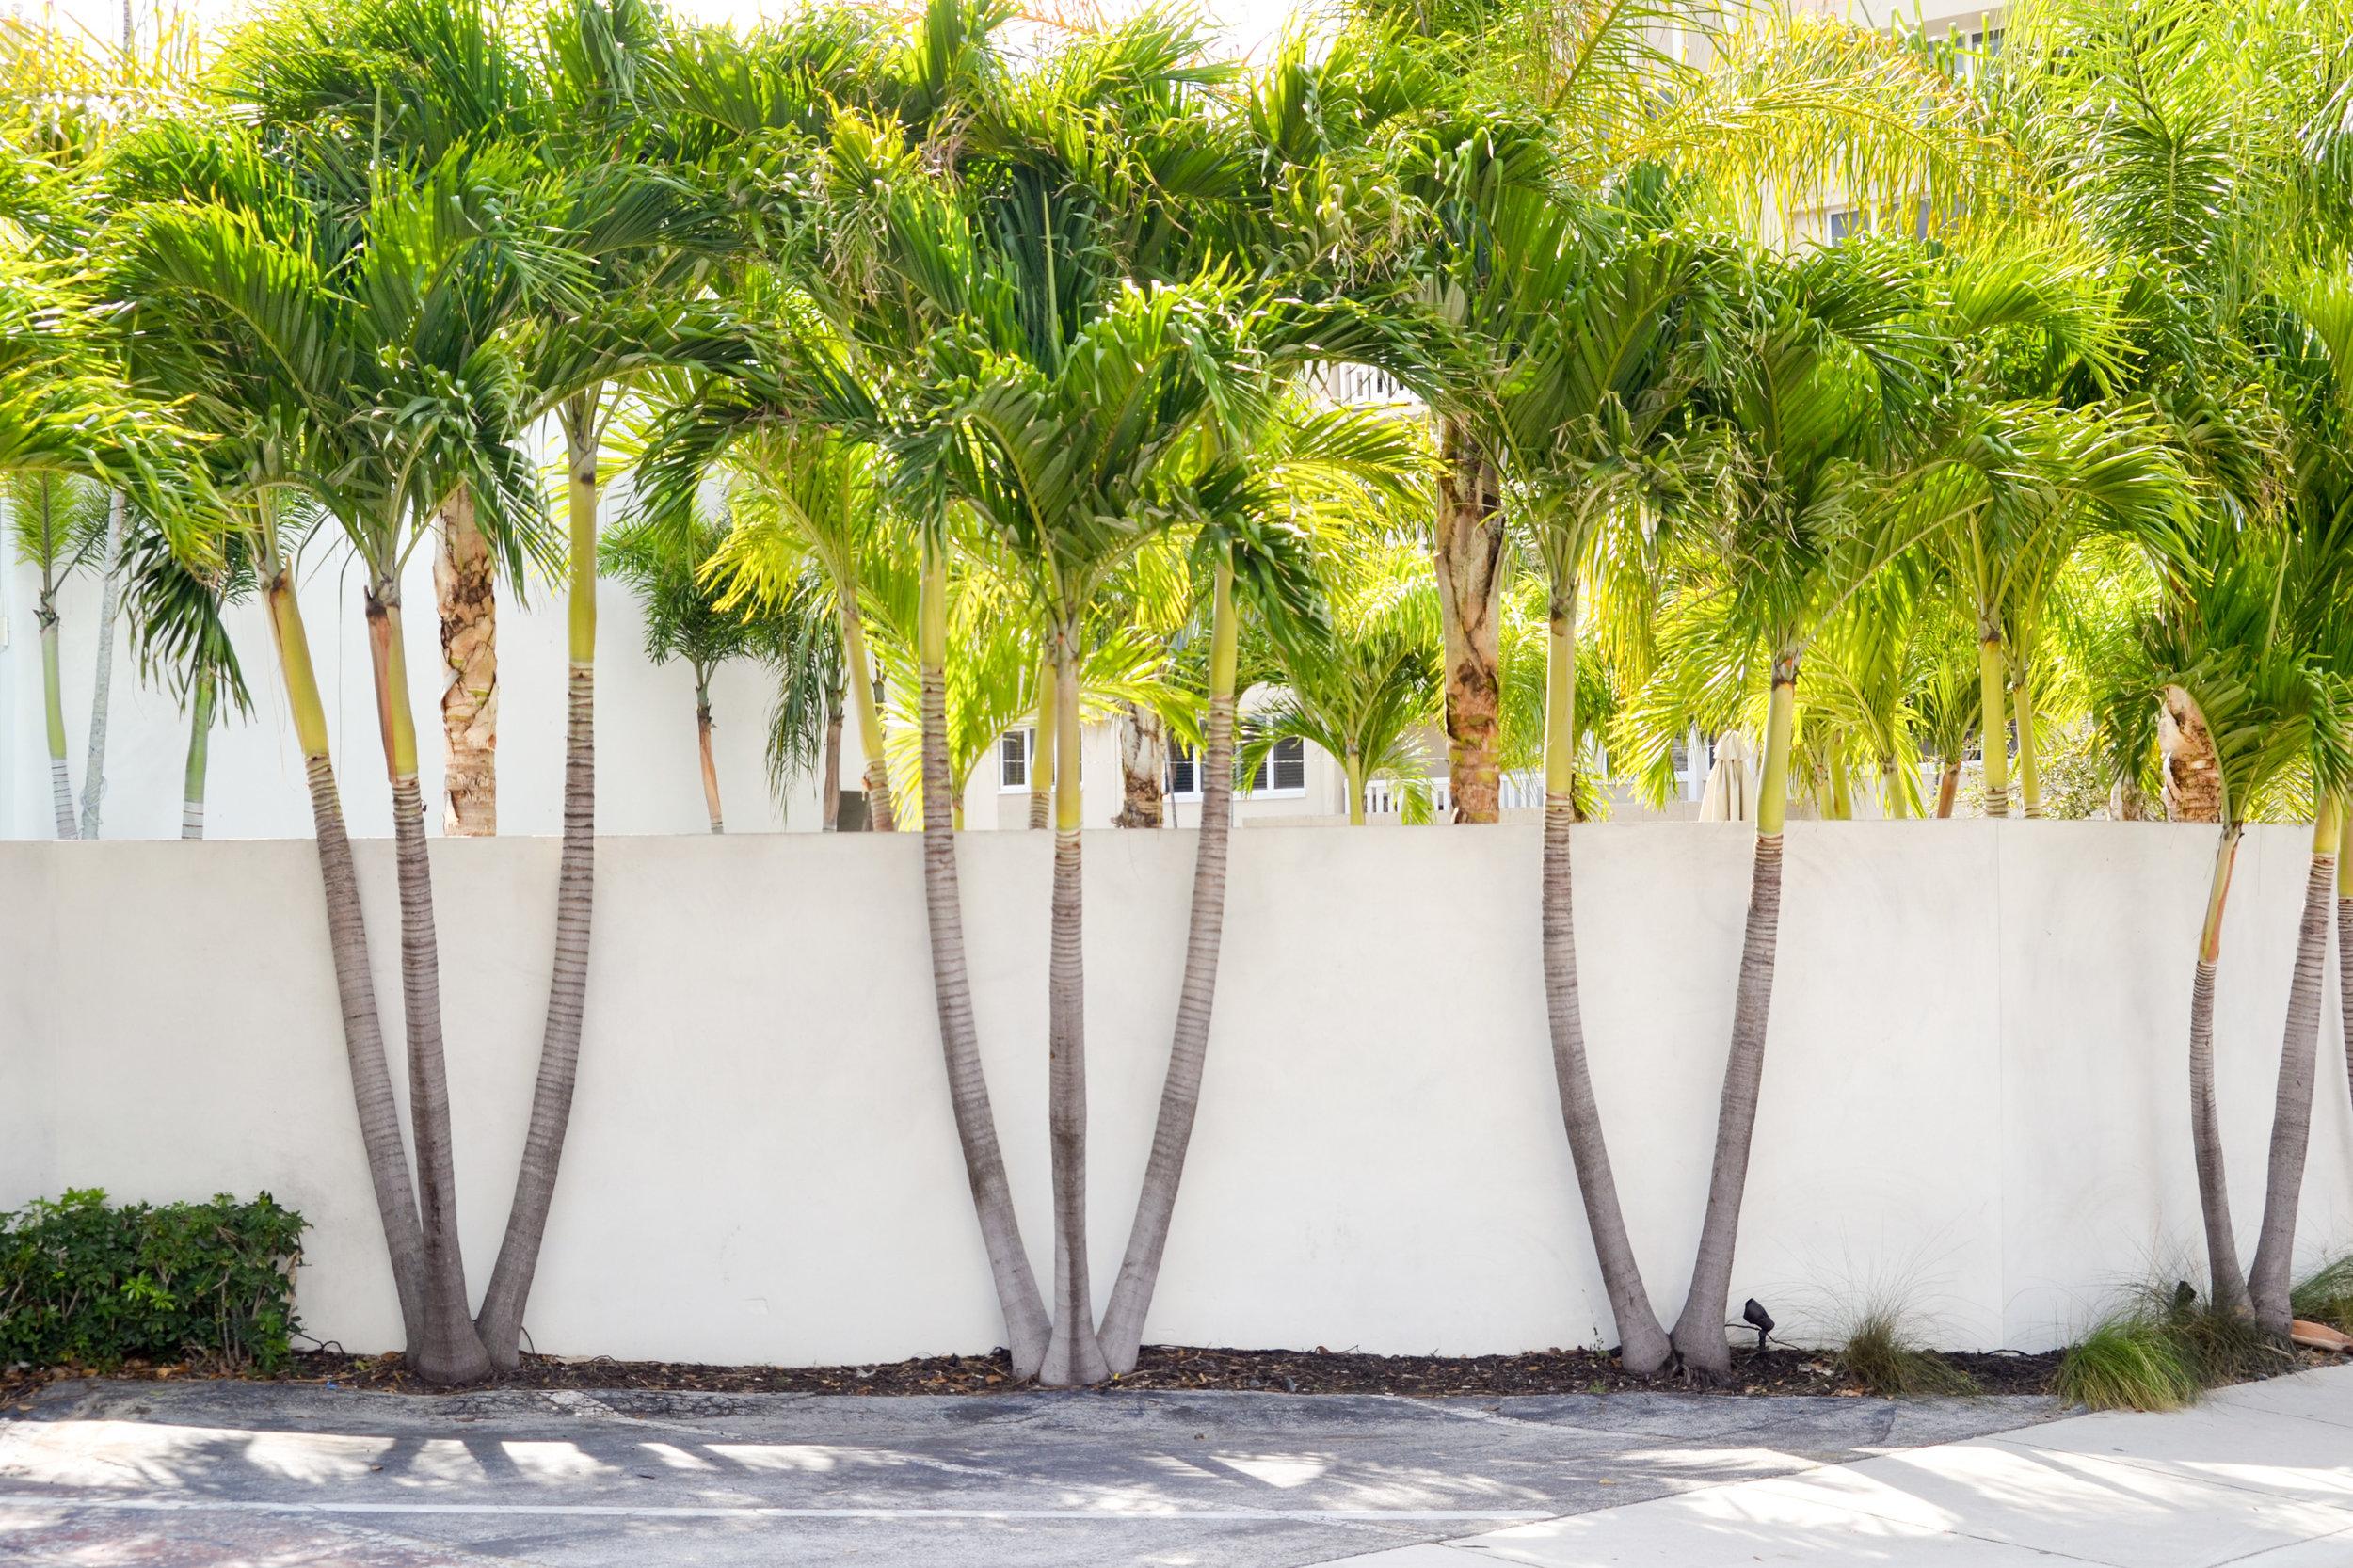 olapi-creative-branding-retreat-palmtrees-fort-lauderdale-florida